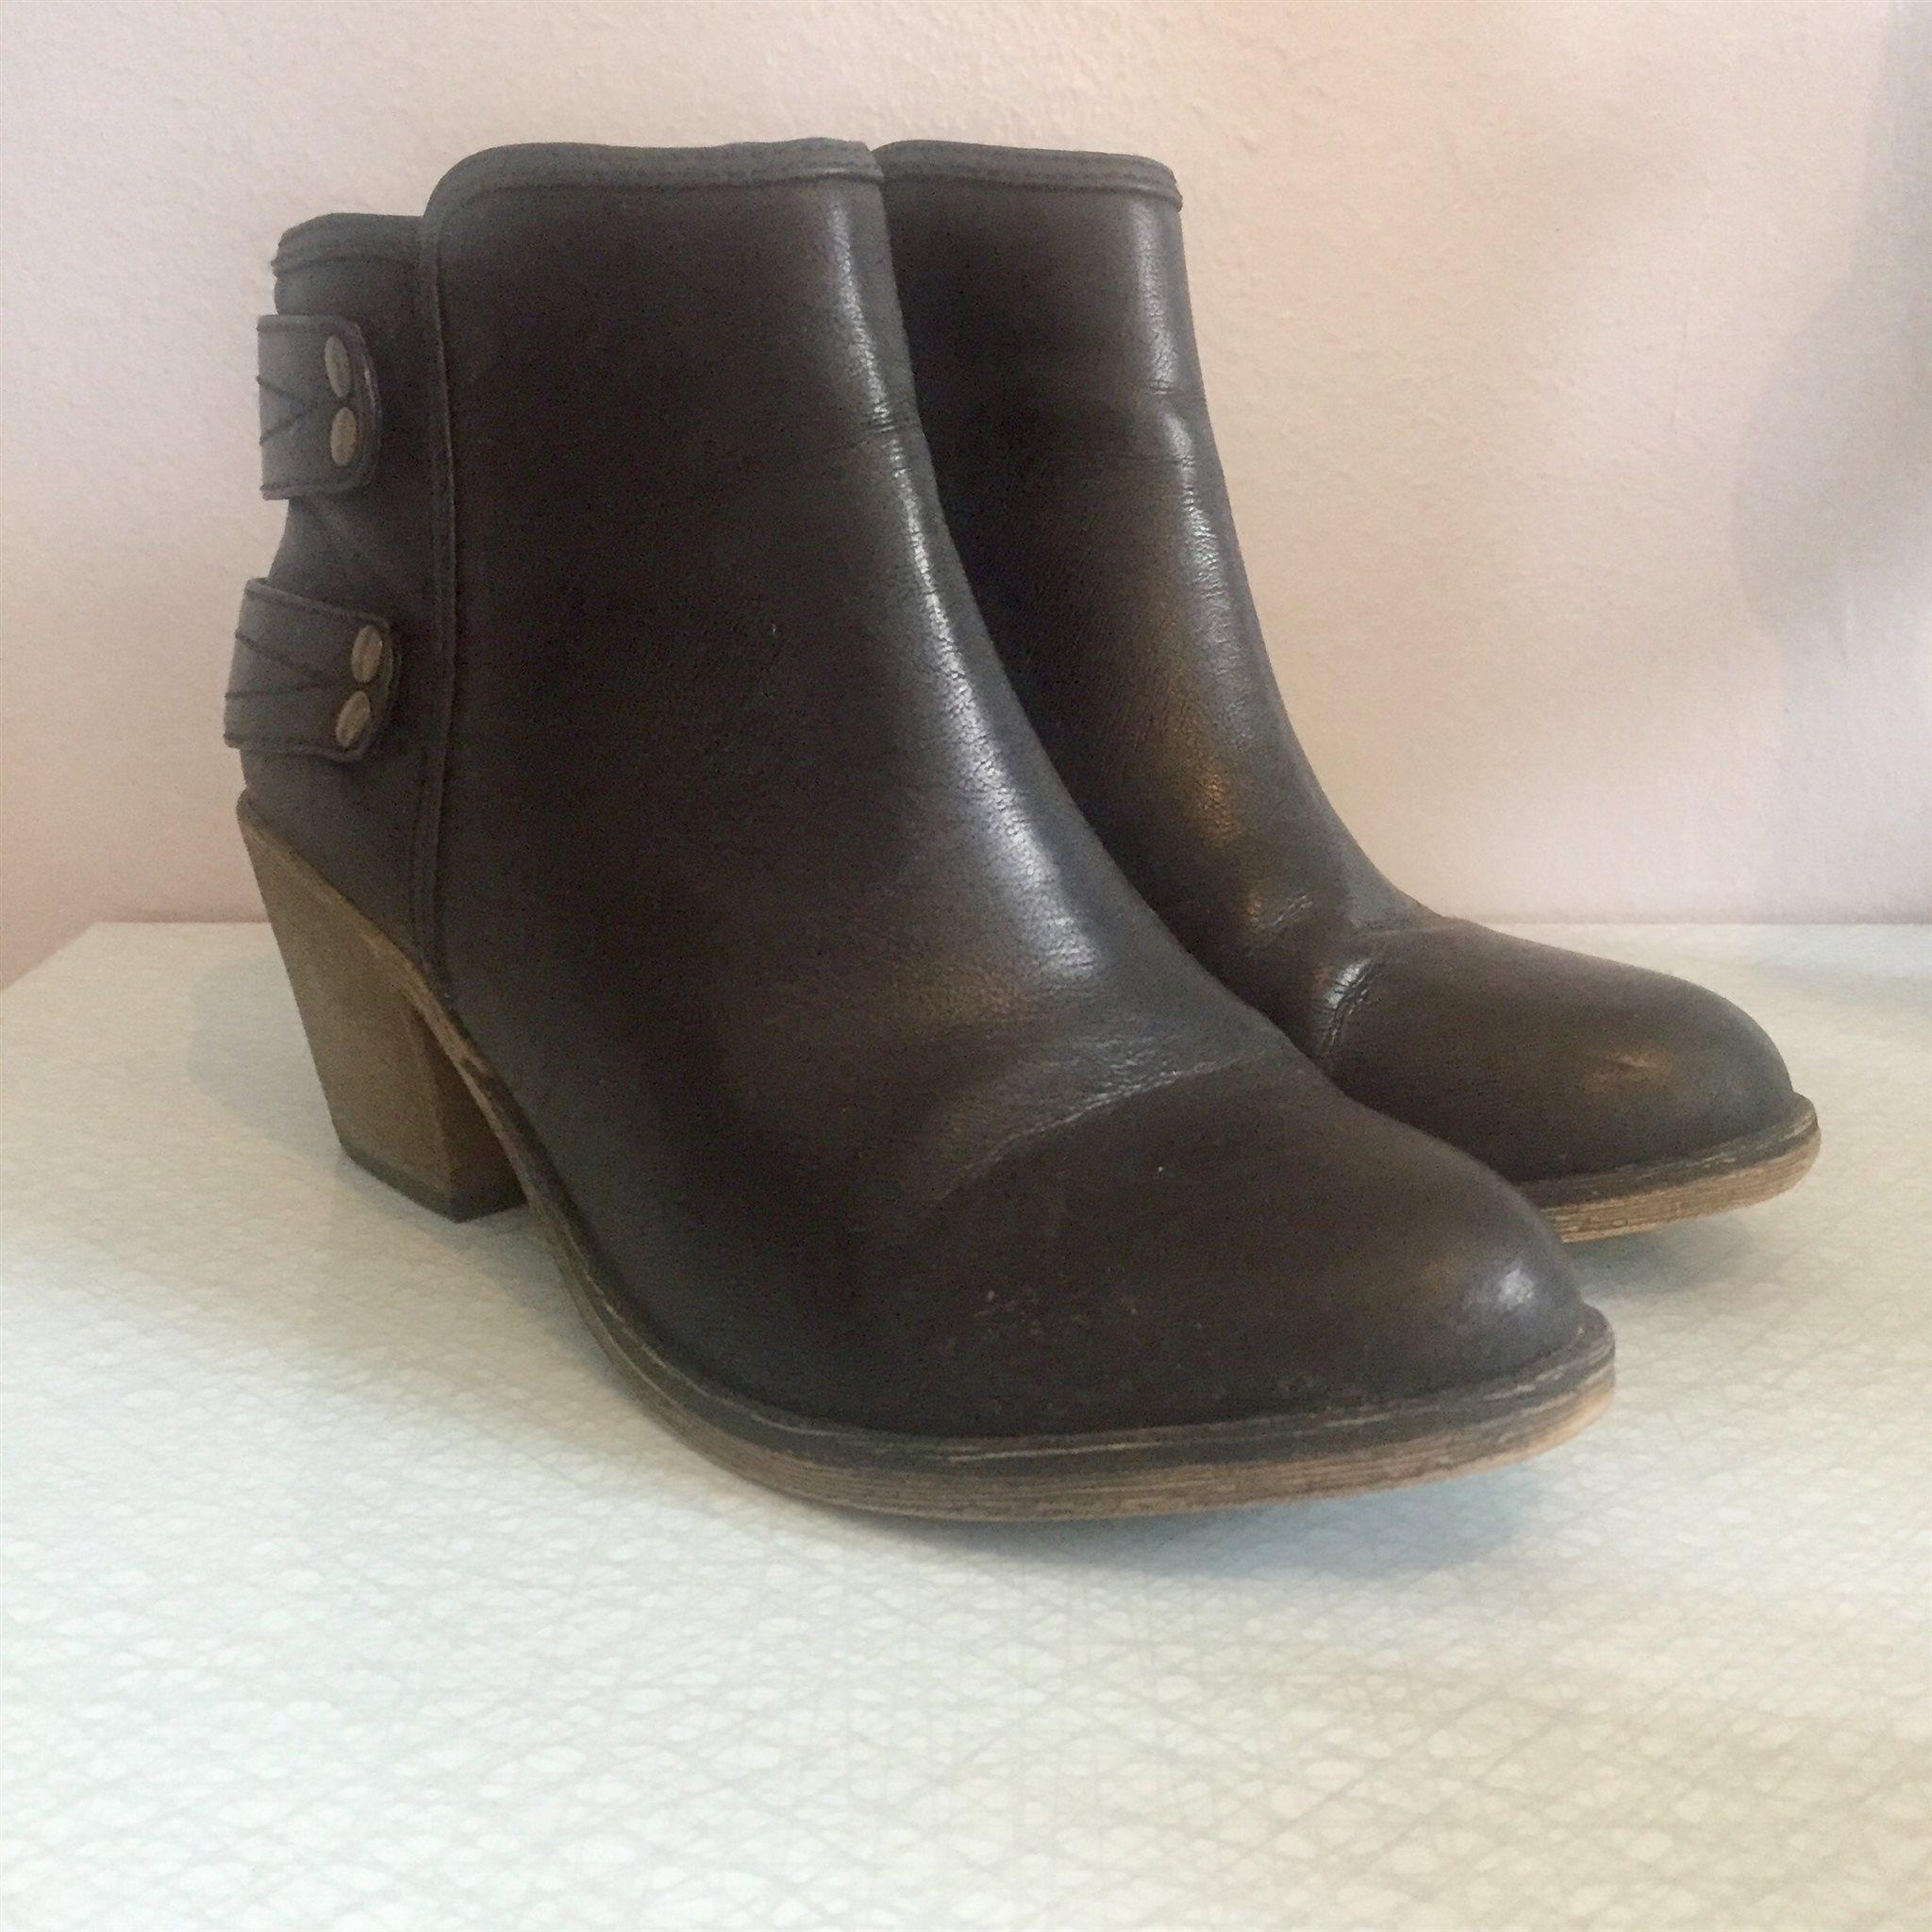 Din sko Dinsko kängor svarta stövletter boots k.. (339181536) ᐈ Köp ... a3a835ff91b99